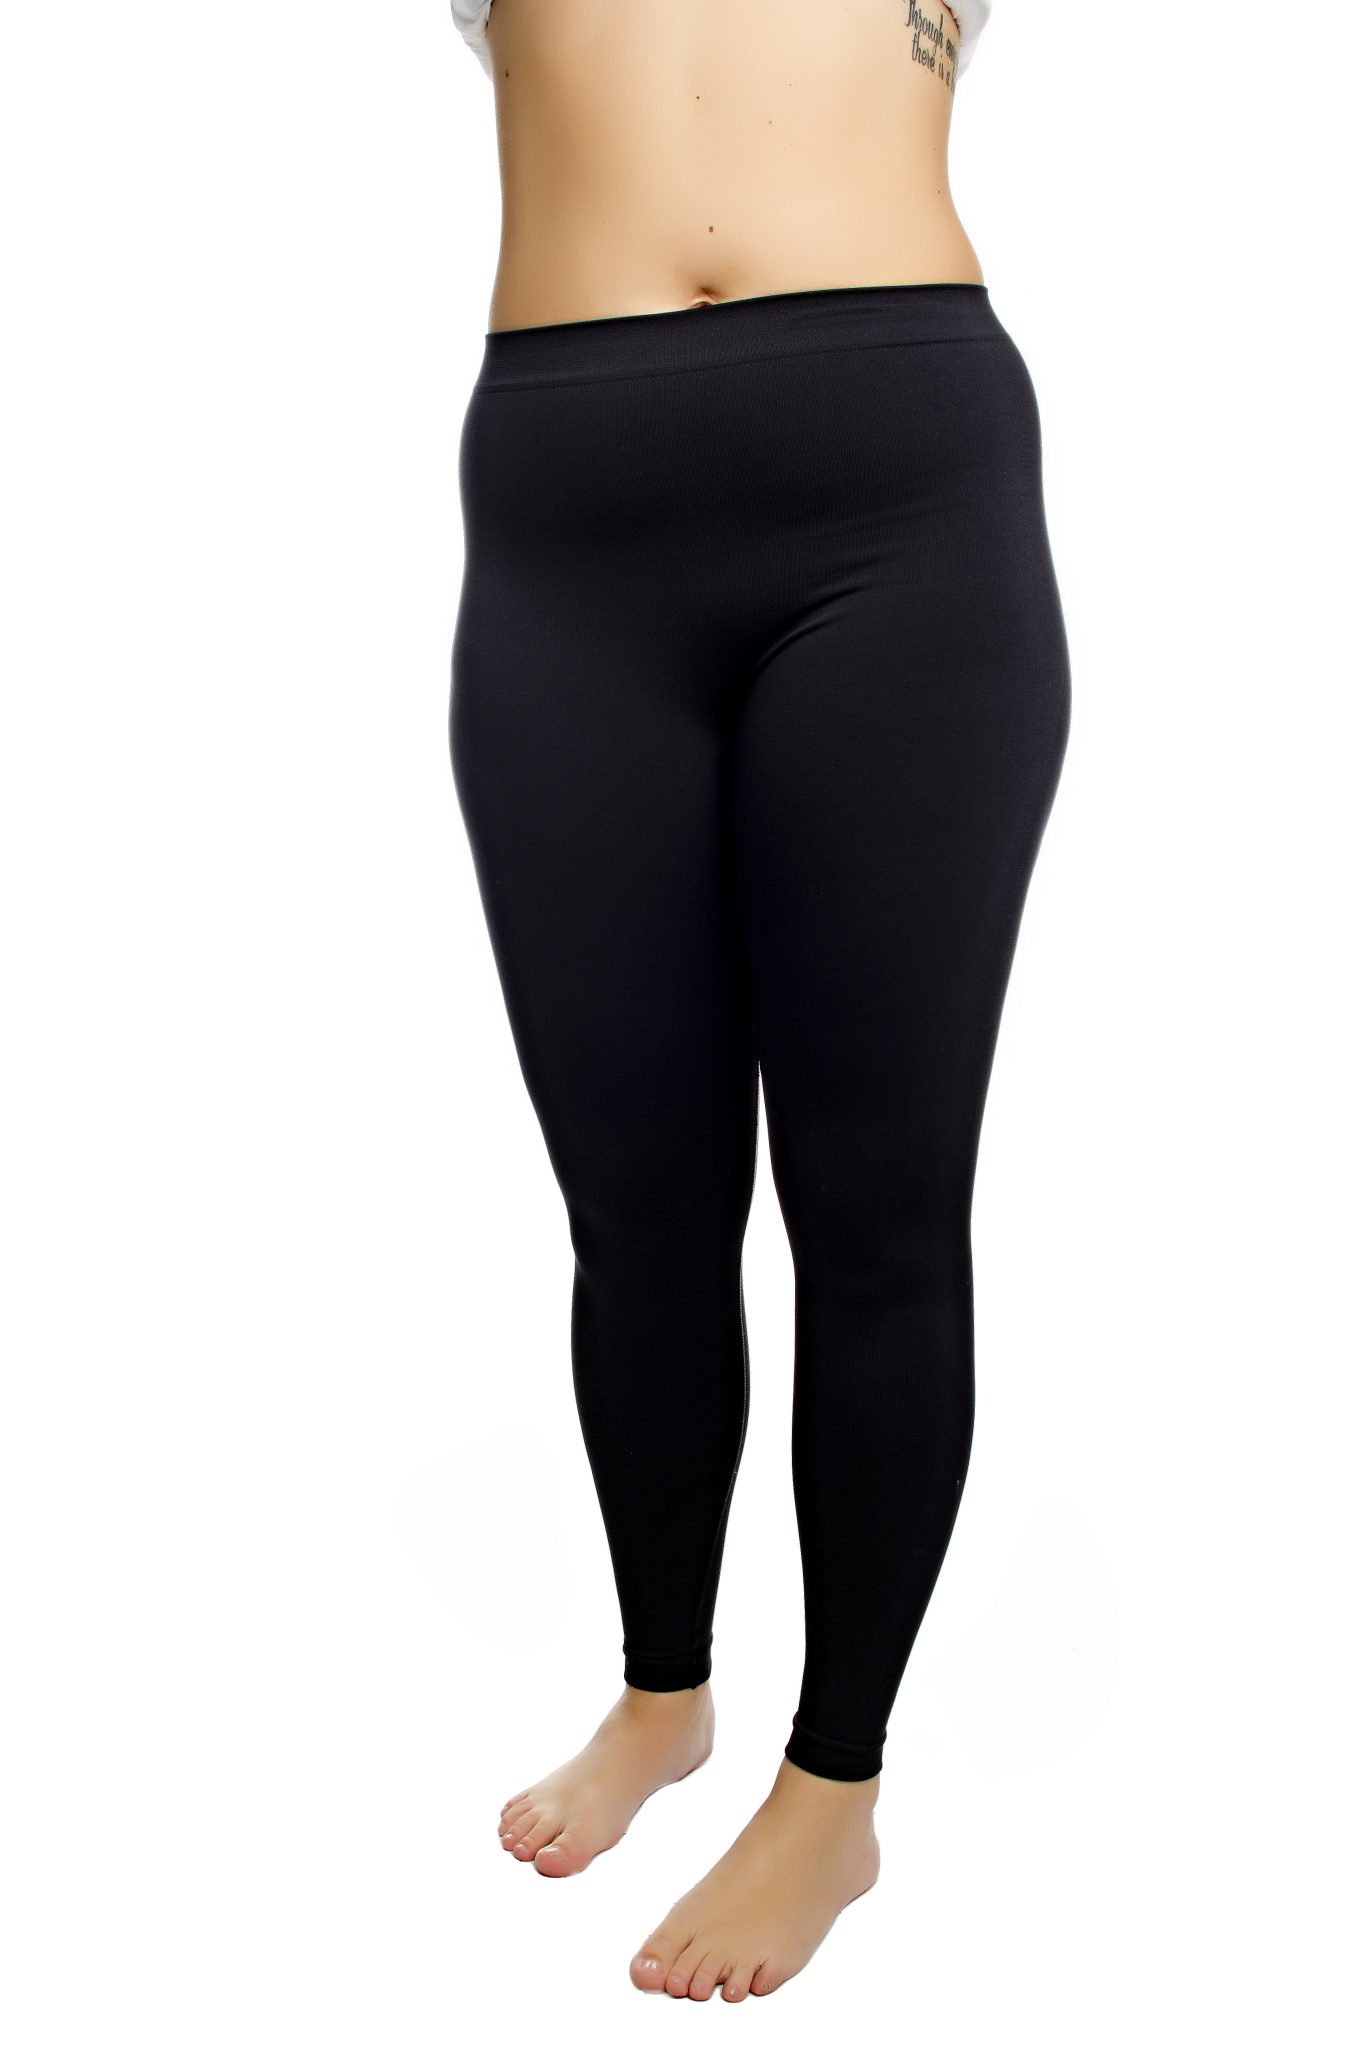 chaffree coolmax black leggings plus size up to a size 24